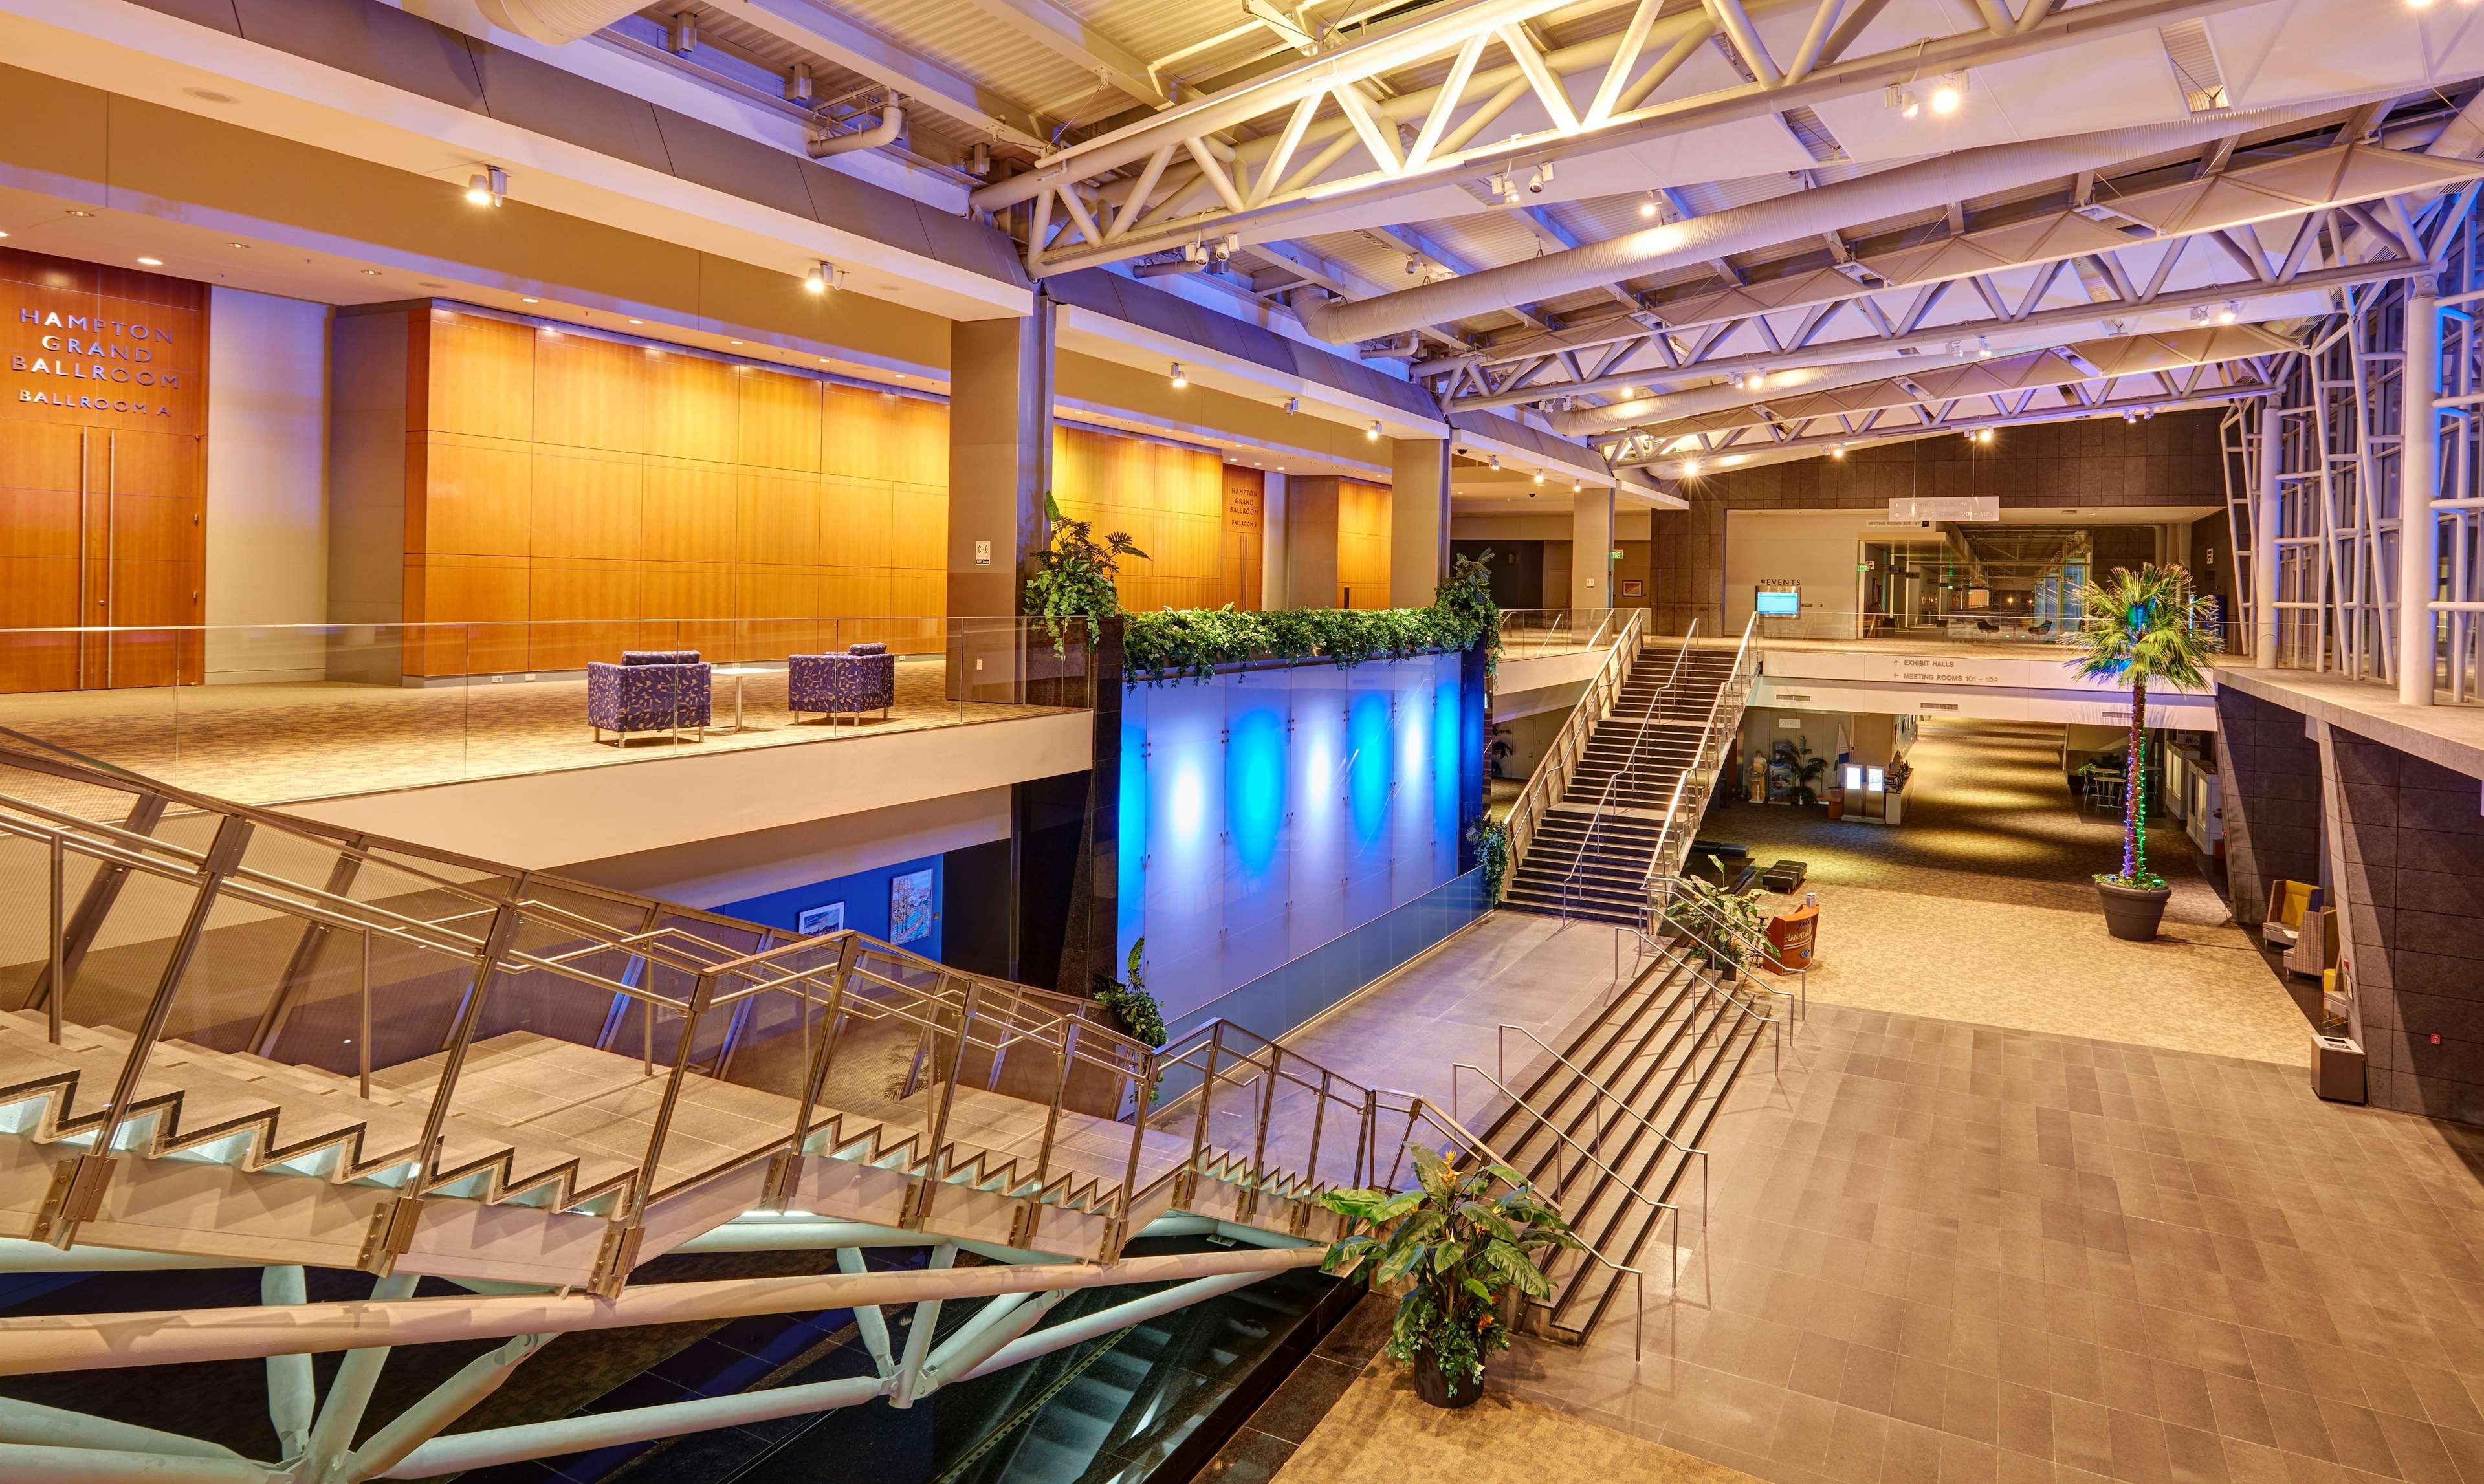 embassy suites by hilton hampton hotel convention center. Black Bedroom Furniture Sets. Home Design Ideas